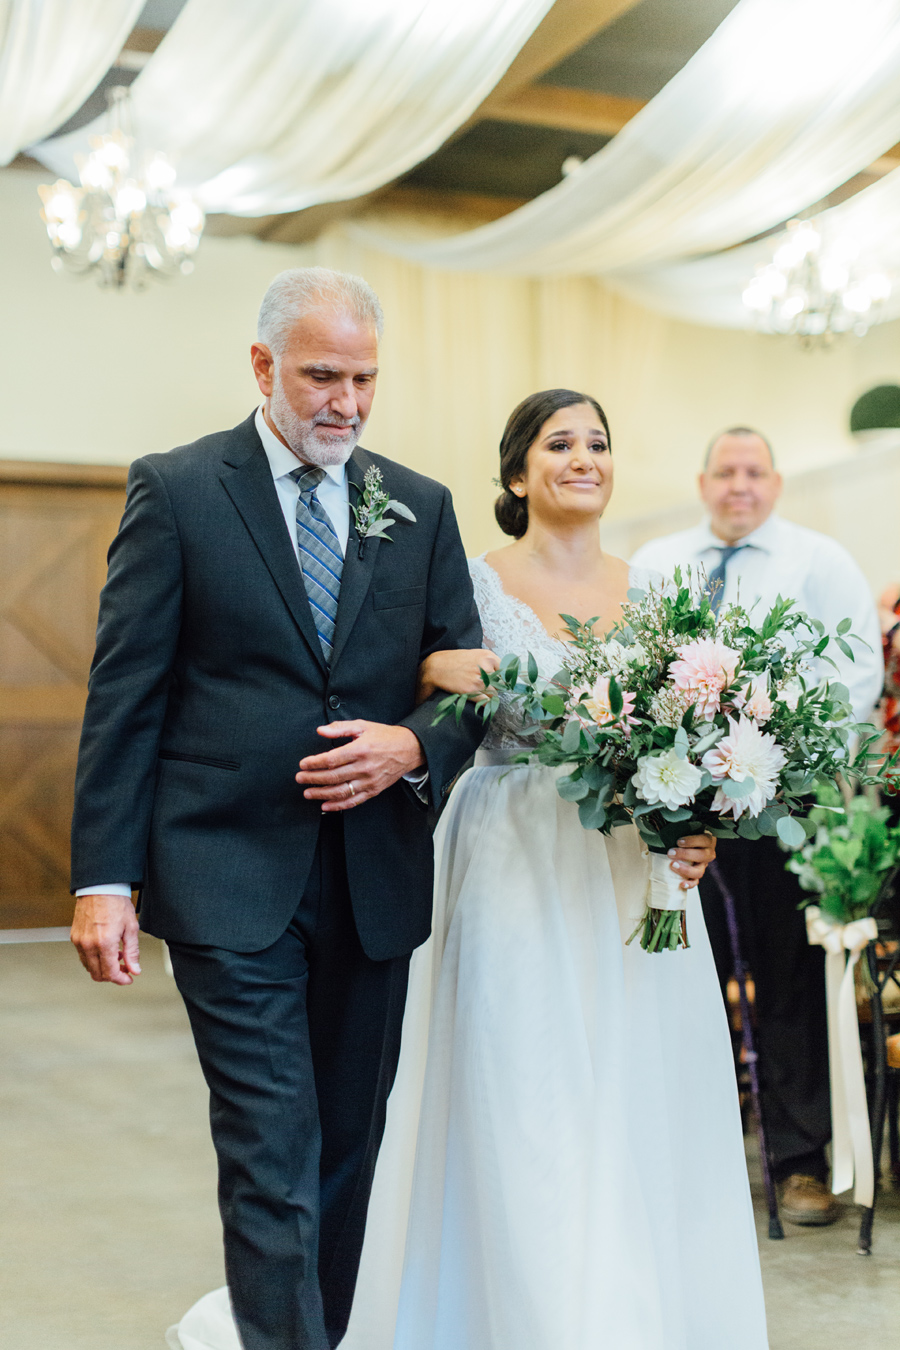 the-inn-at-leola-wedding-lancaster-pennsylvania-wedding-photographer-rebeka-viola-photograhy (55).jpg